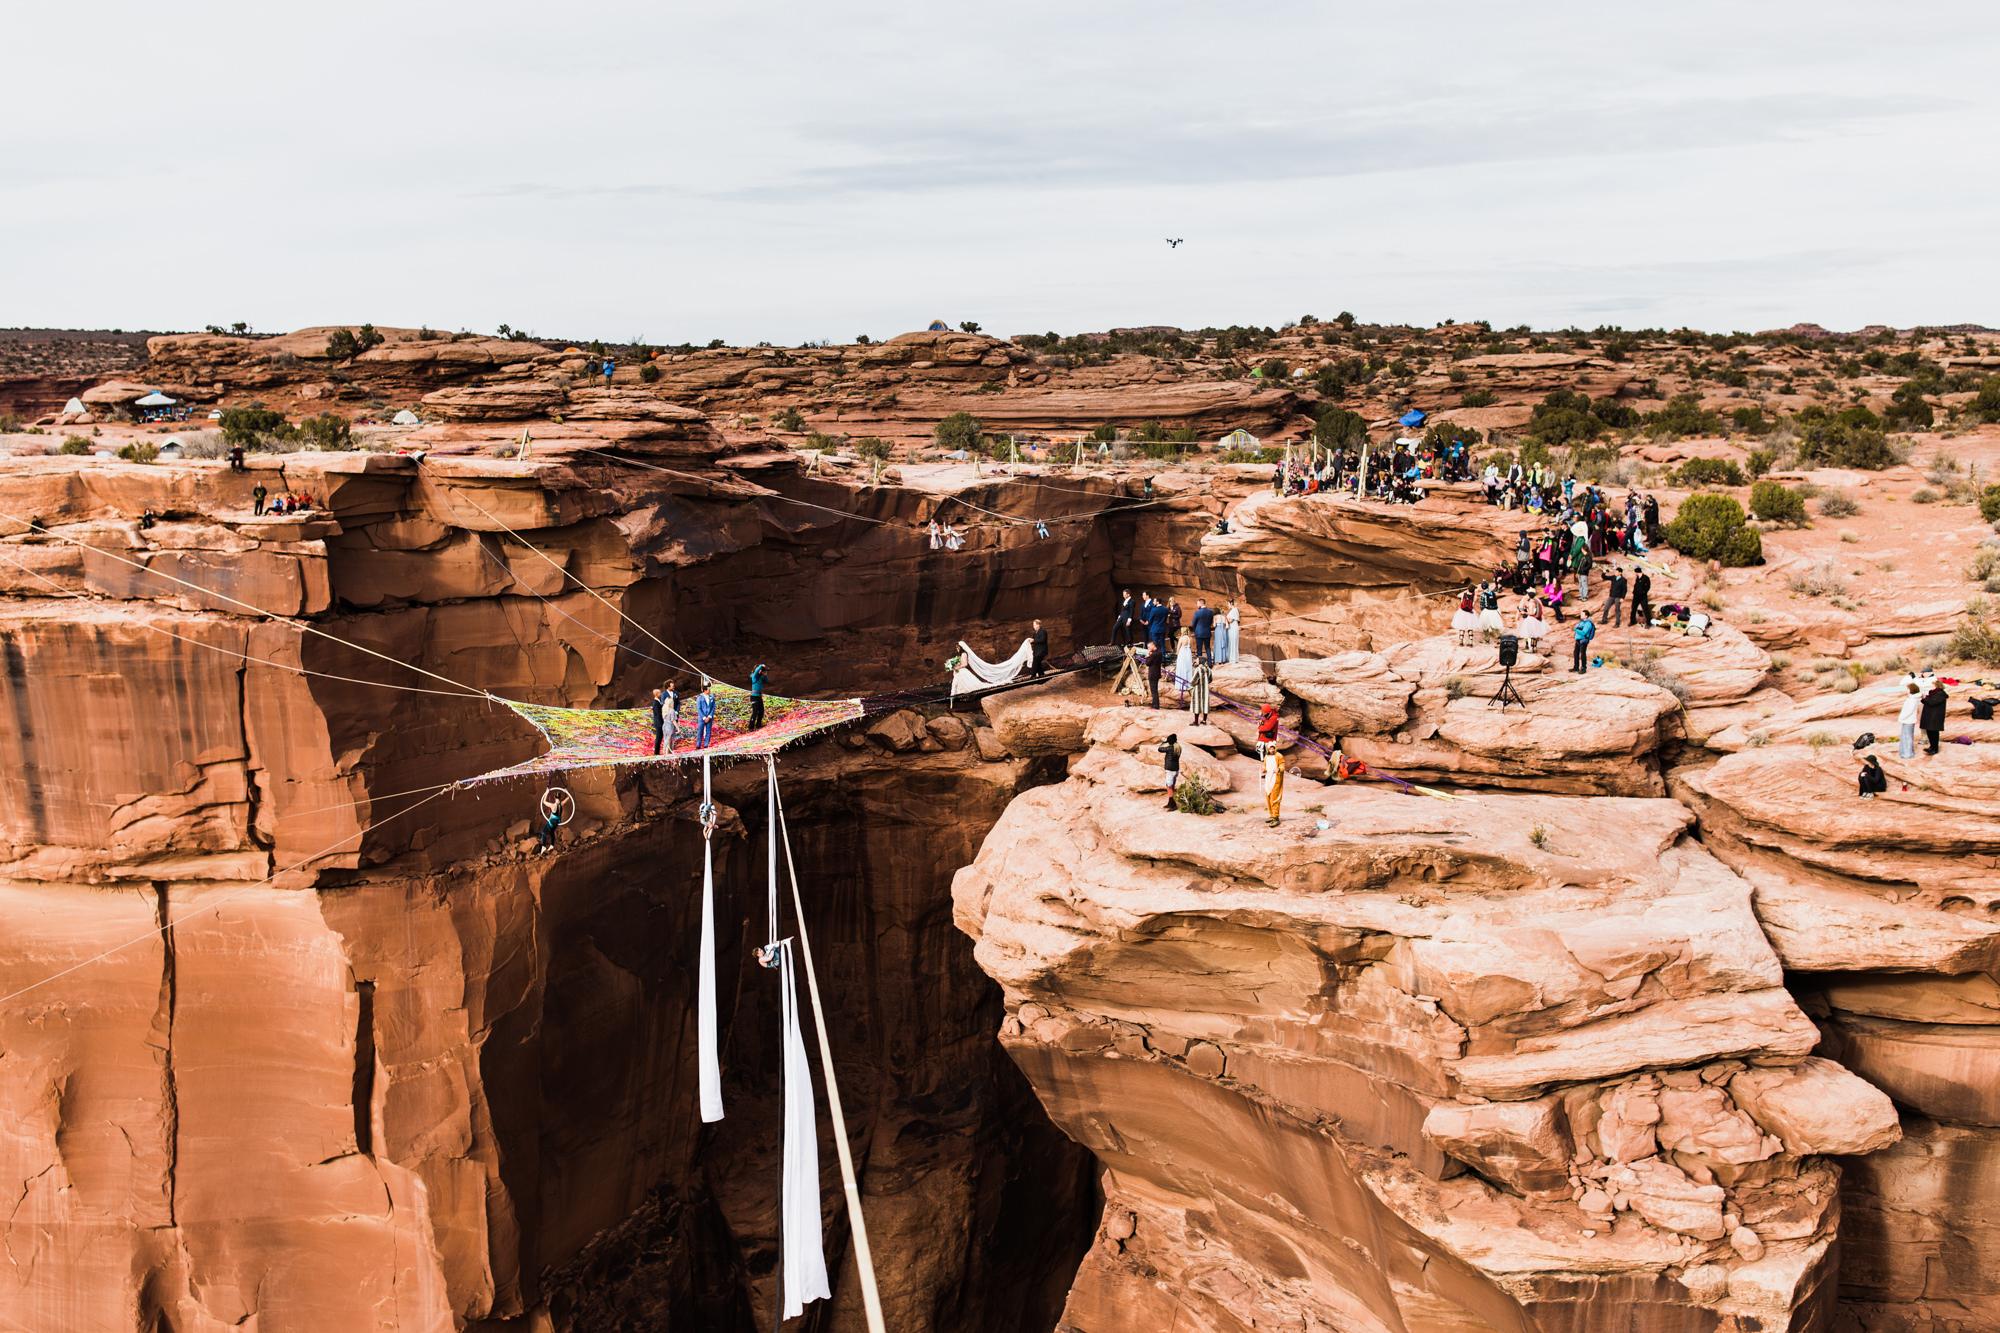 spacenet wedding in moab, utah | destination adventure wedding photographers | the hearnes adventure photography | www.thehearnes.com